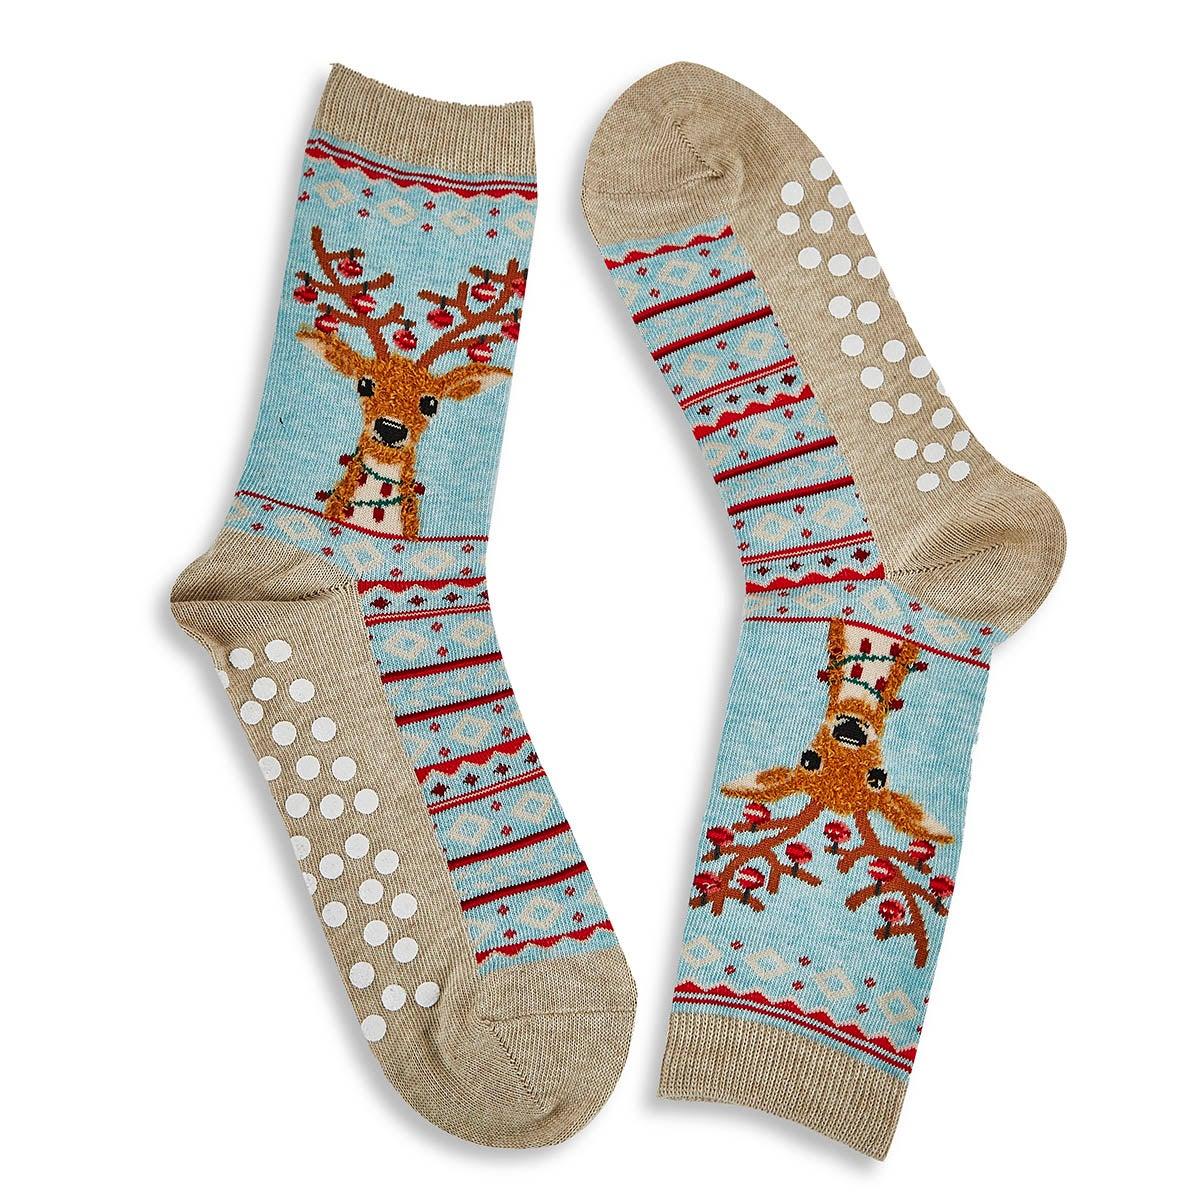 Women's Fuzzy Reindeer Non Skid Sock - Mint Multi